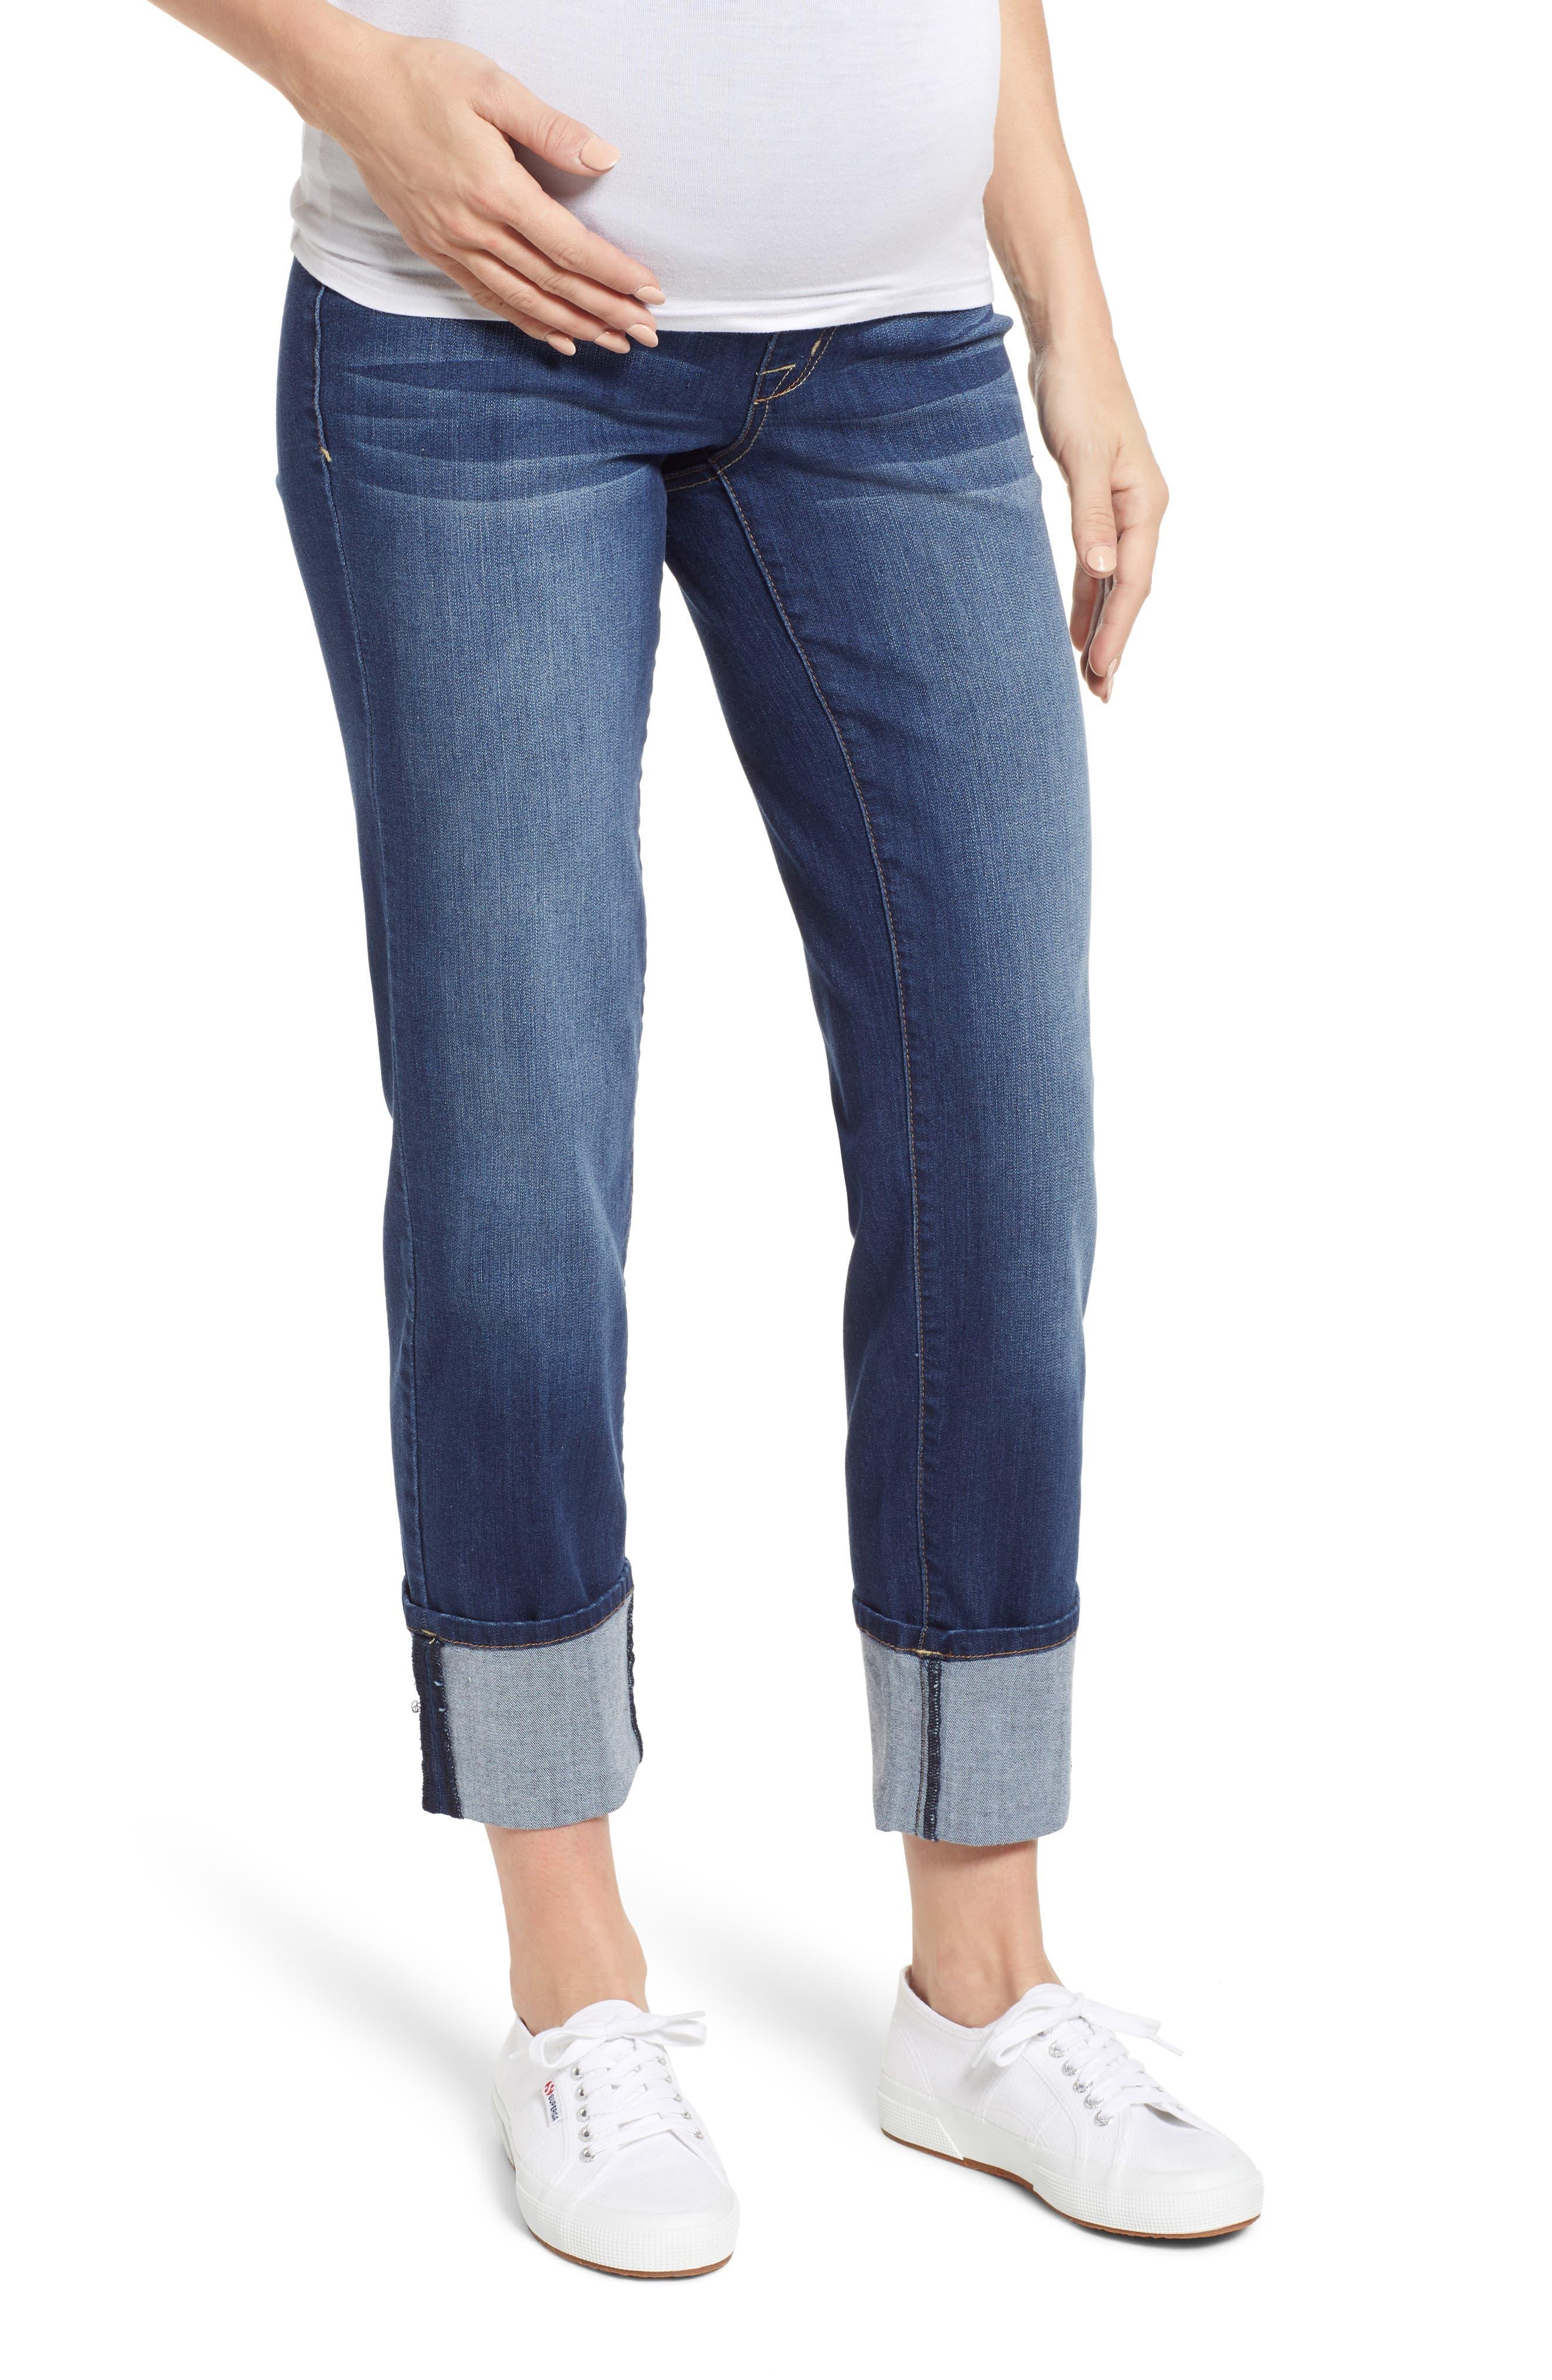 Women's 1822 Denim Cuff Straight Leg Maternity Jeans